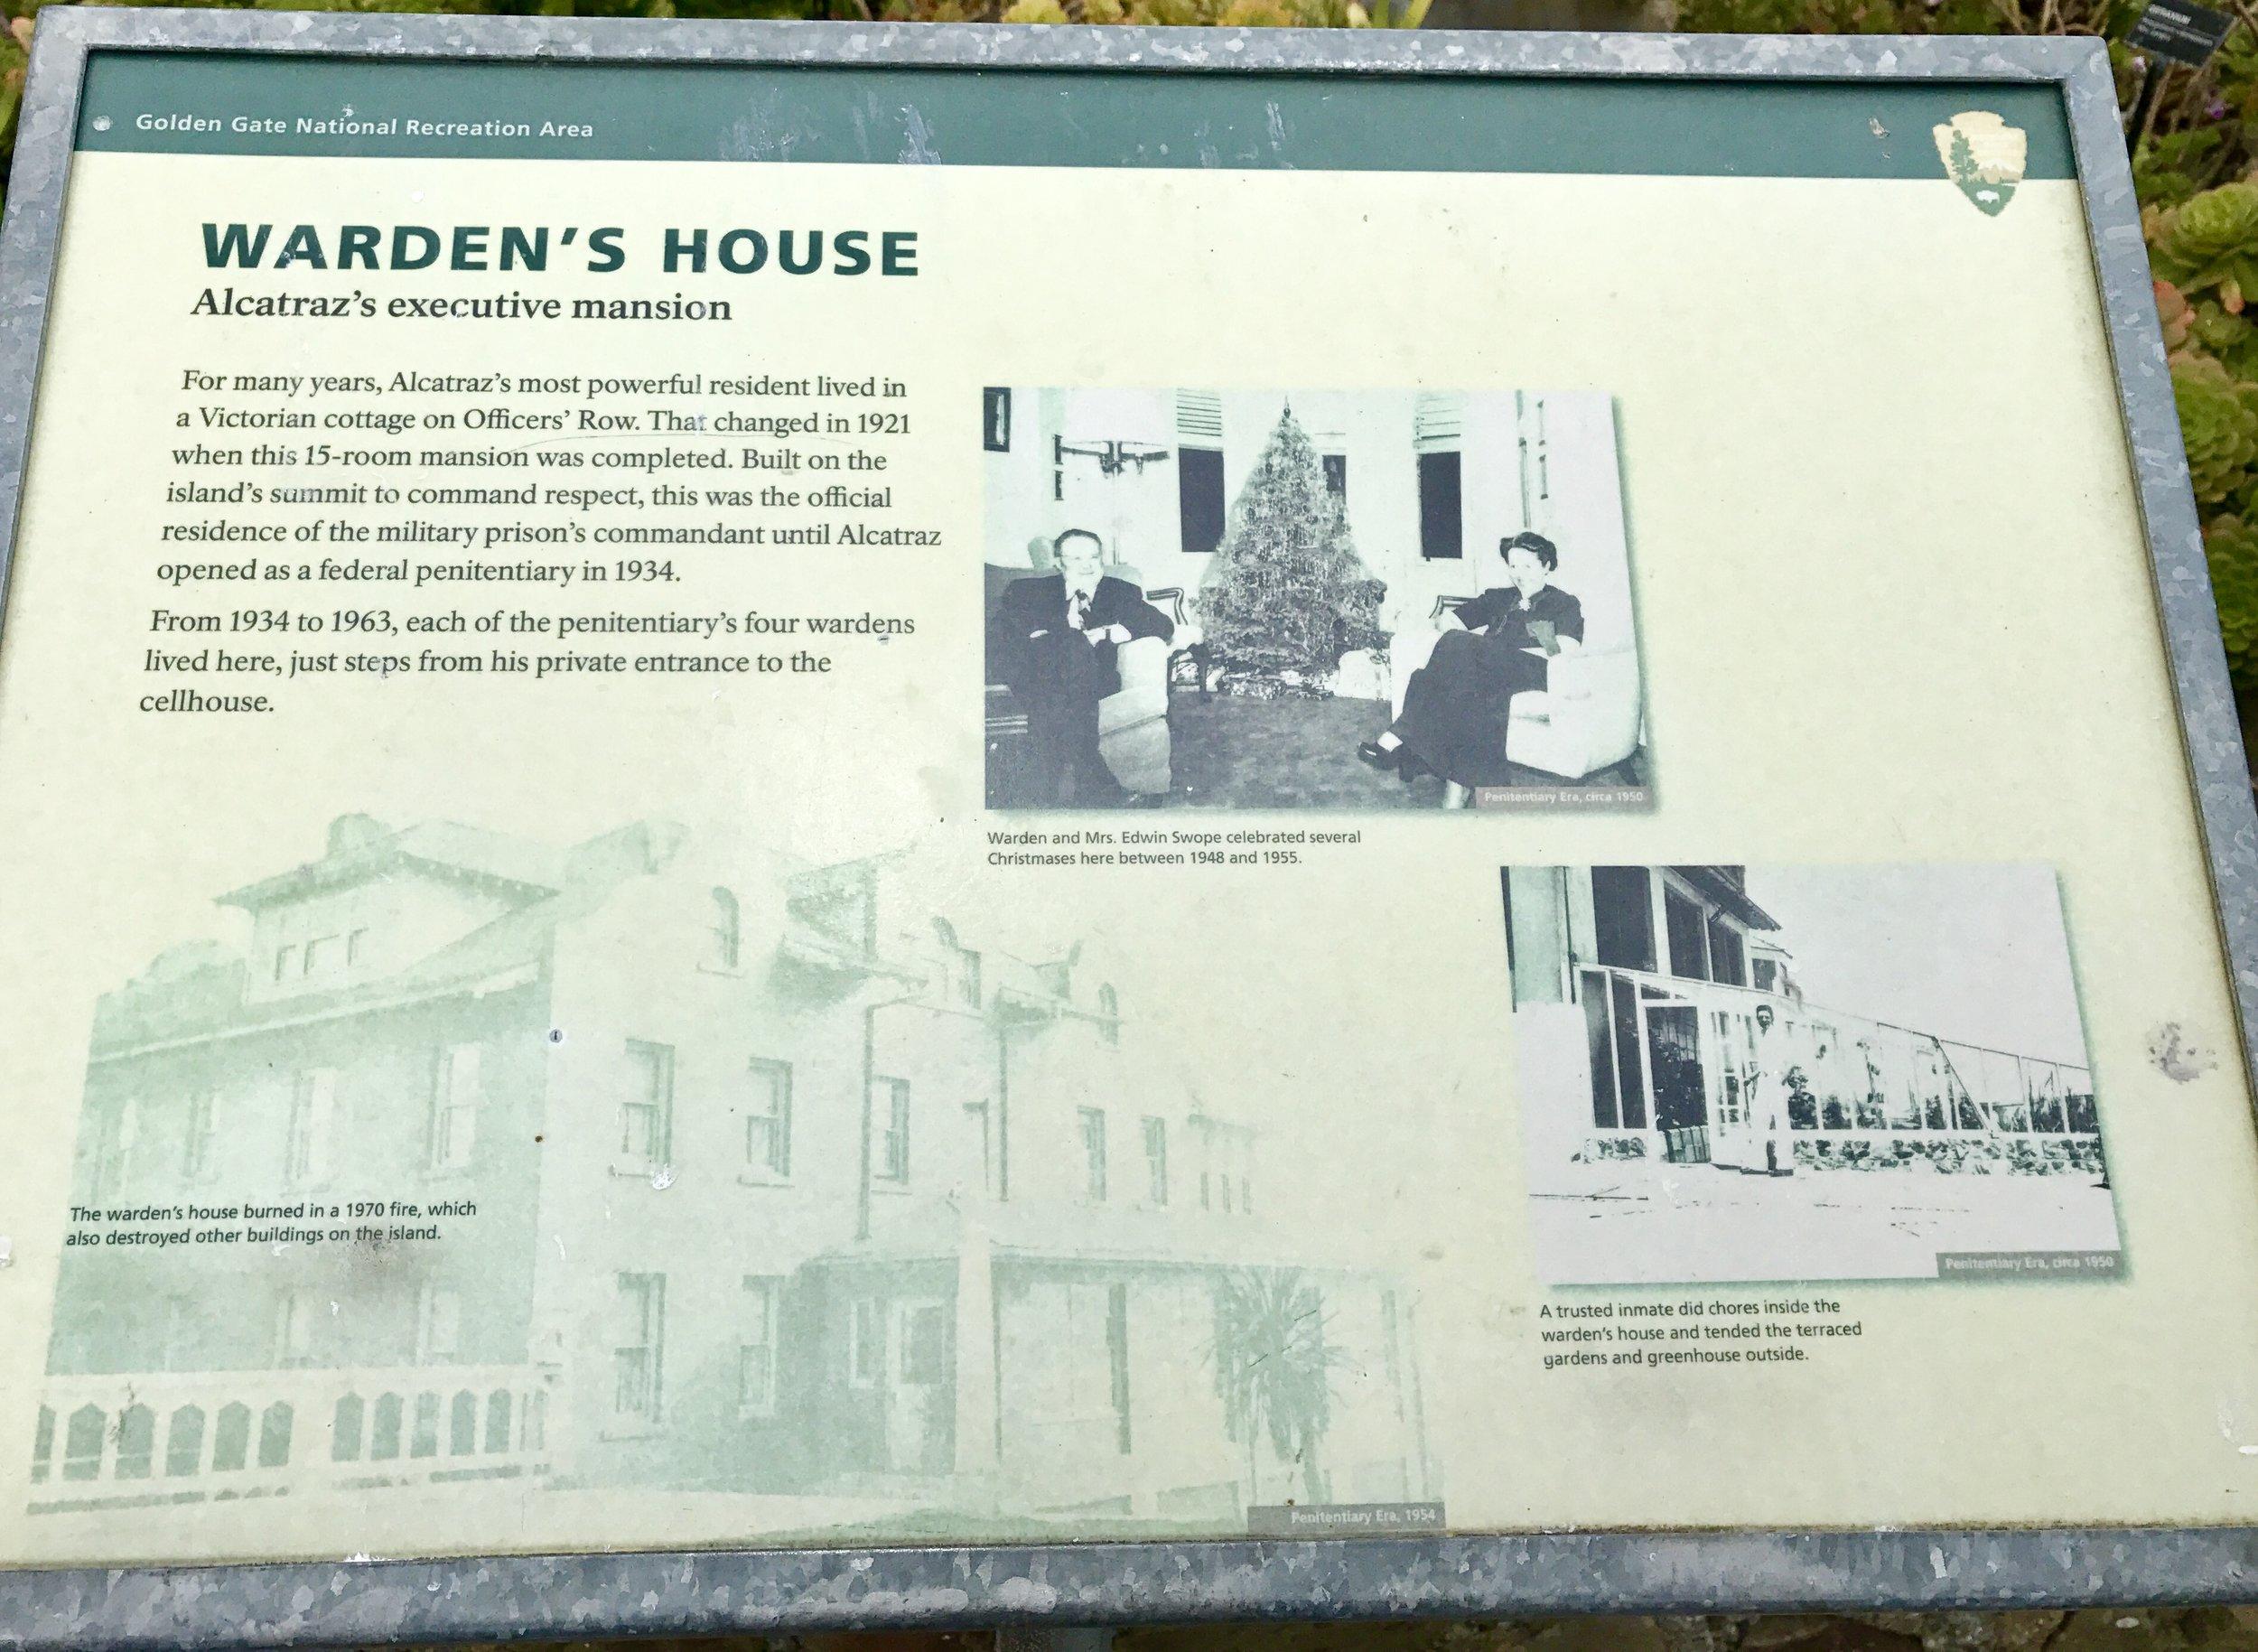 Warden's House